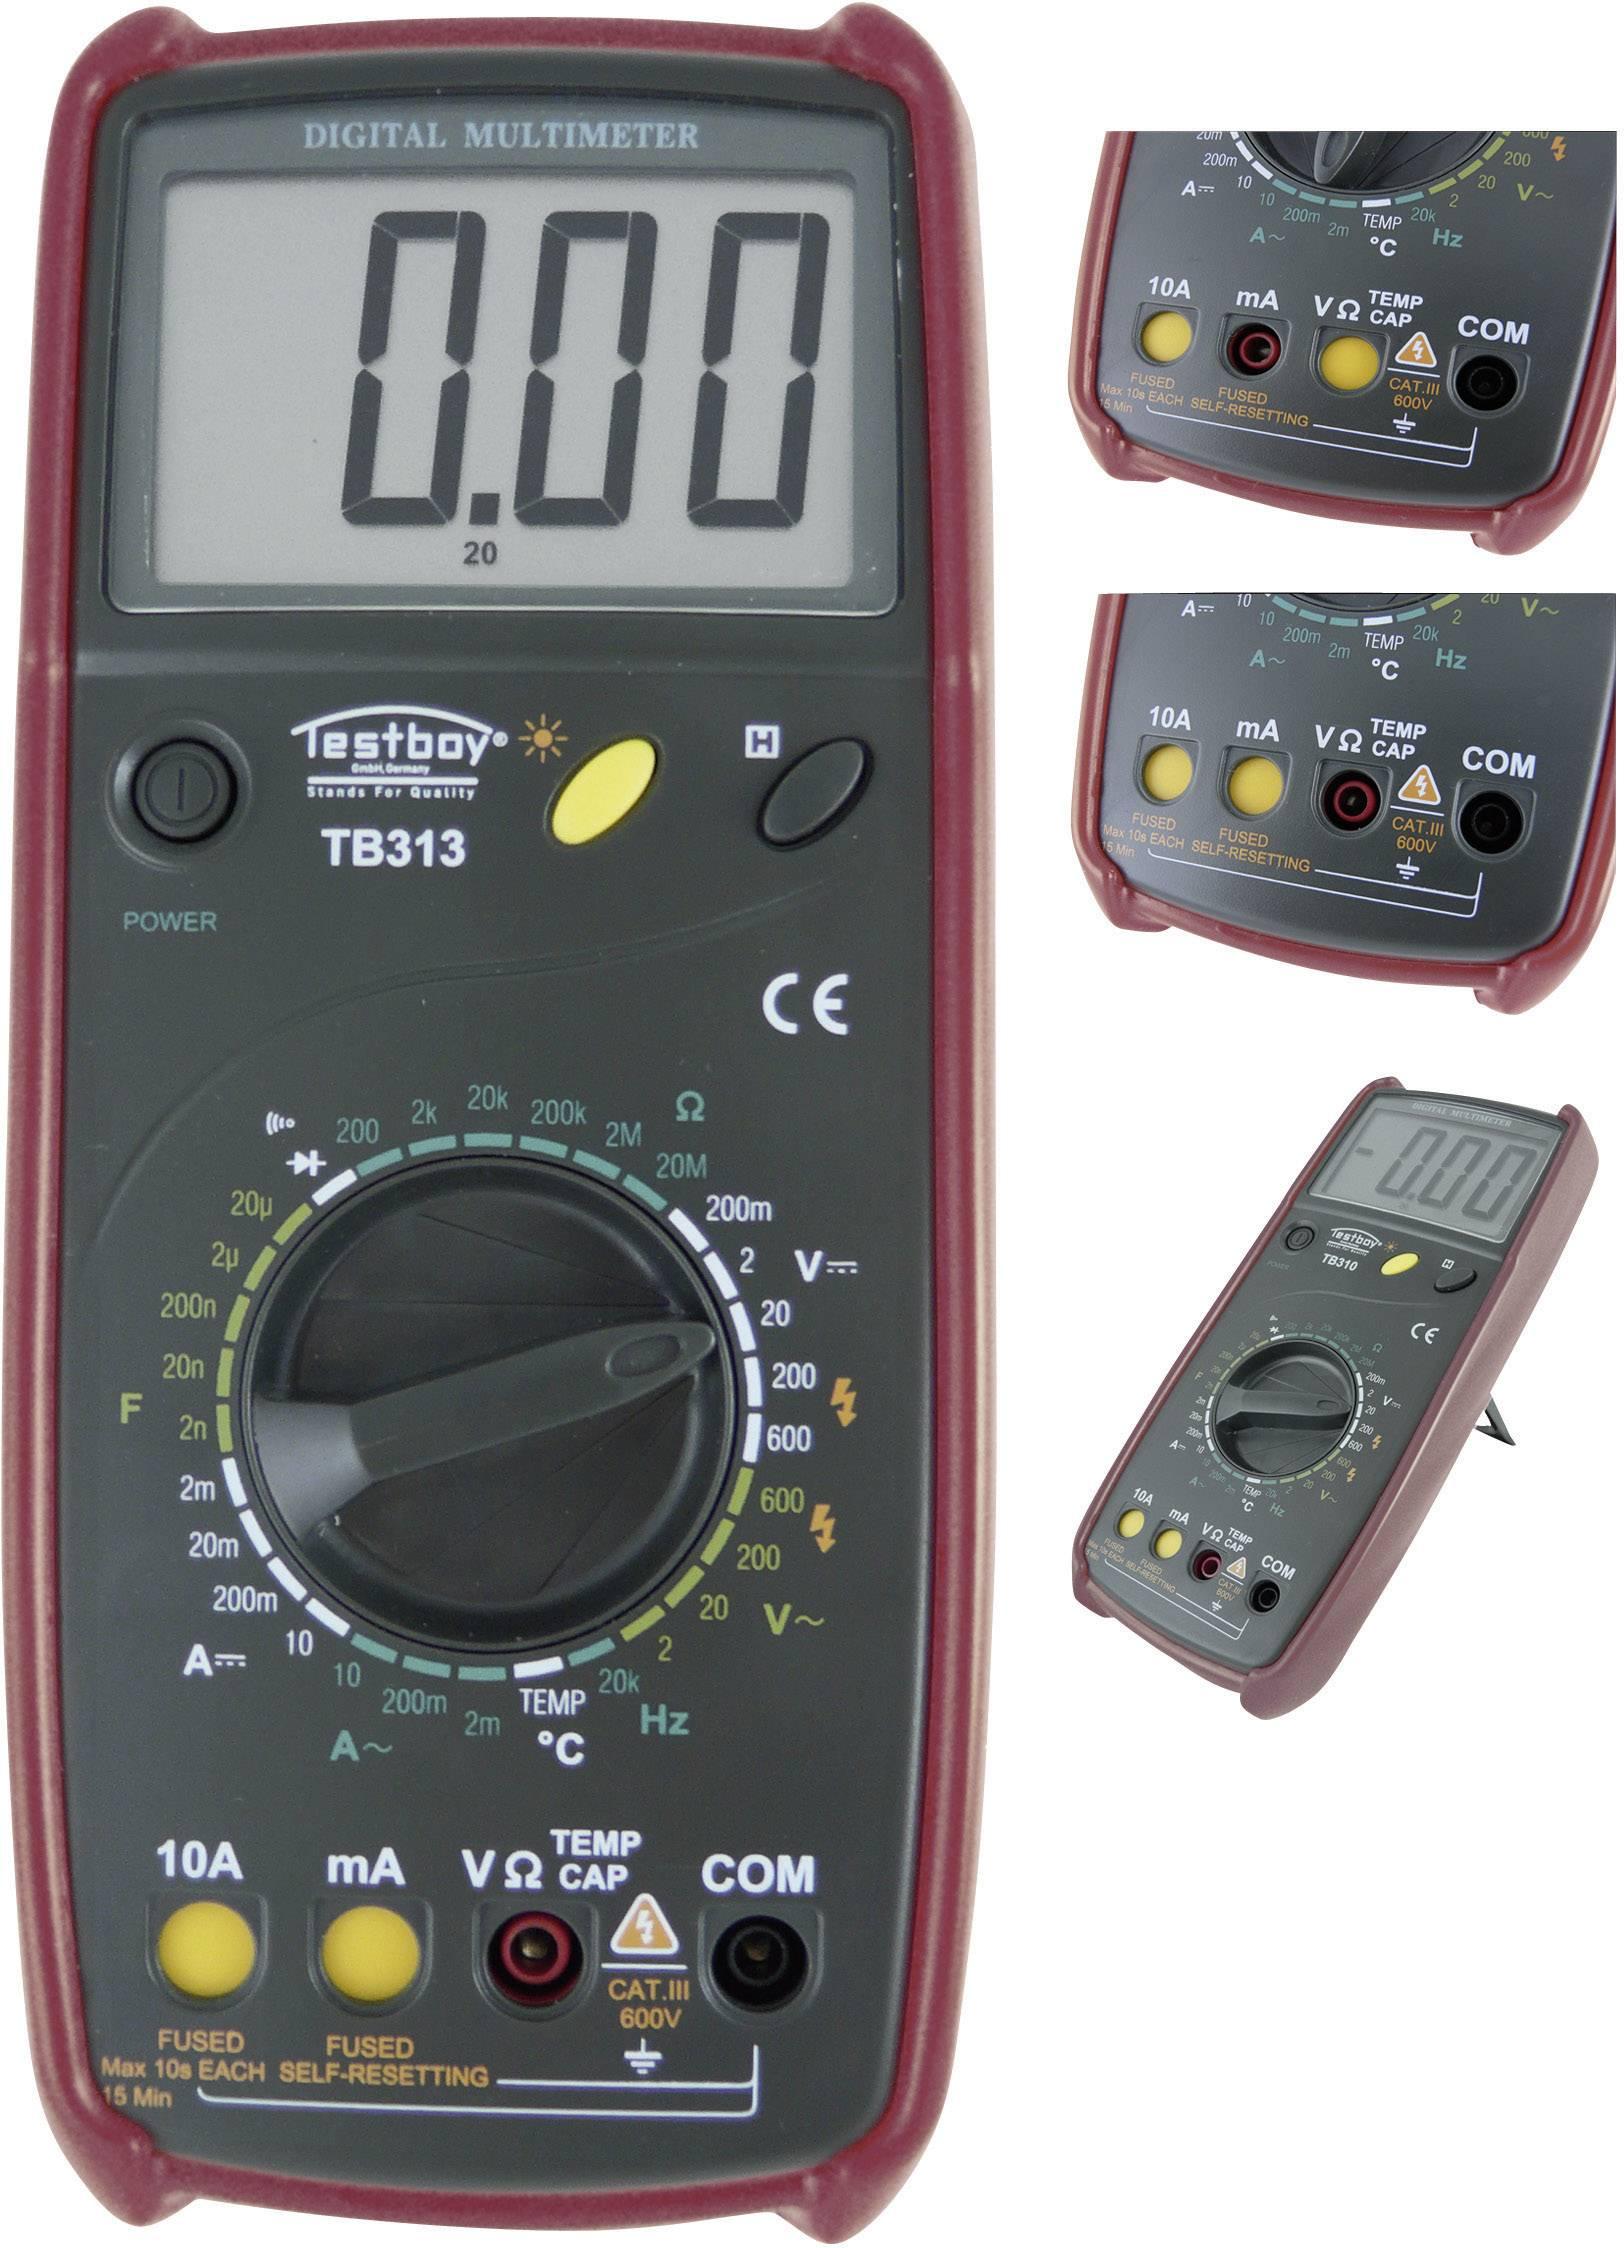 Digitální multimetr Testboy TB 313